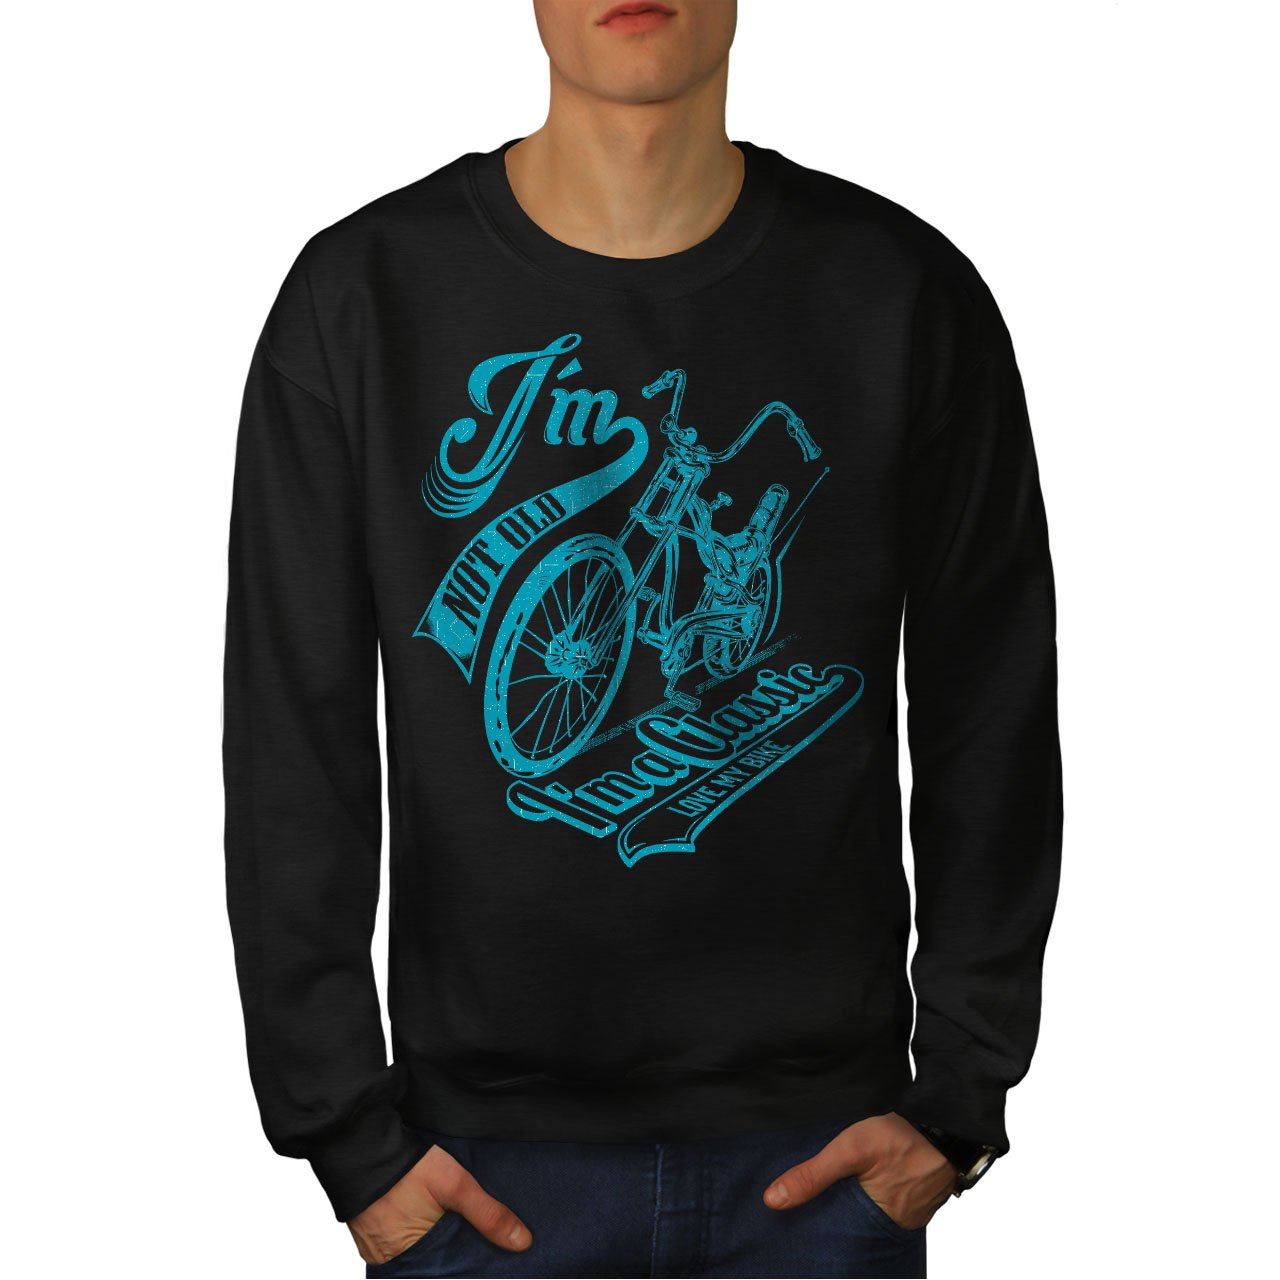 Classic Casual Jumper wellcoda Bike Motor Mens Sweatshirt